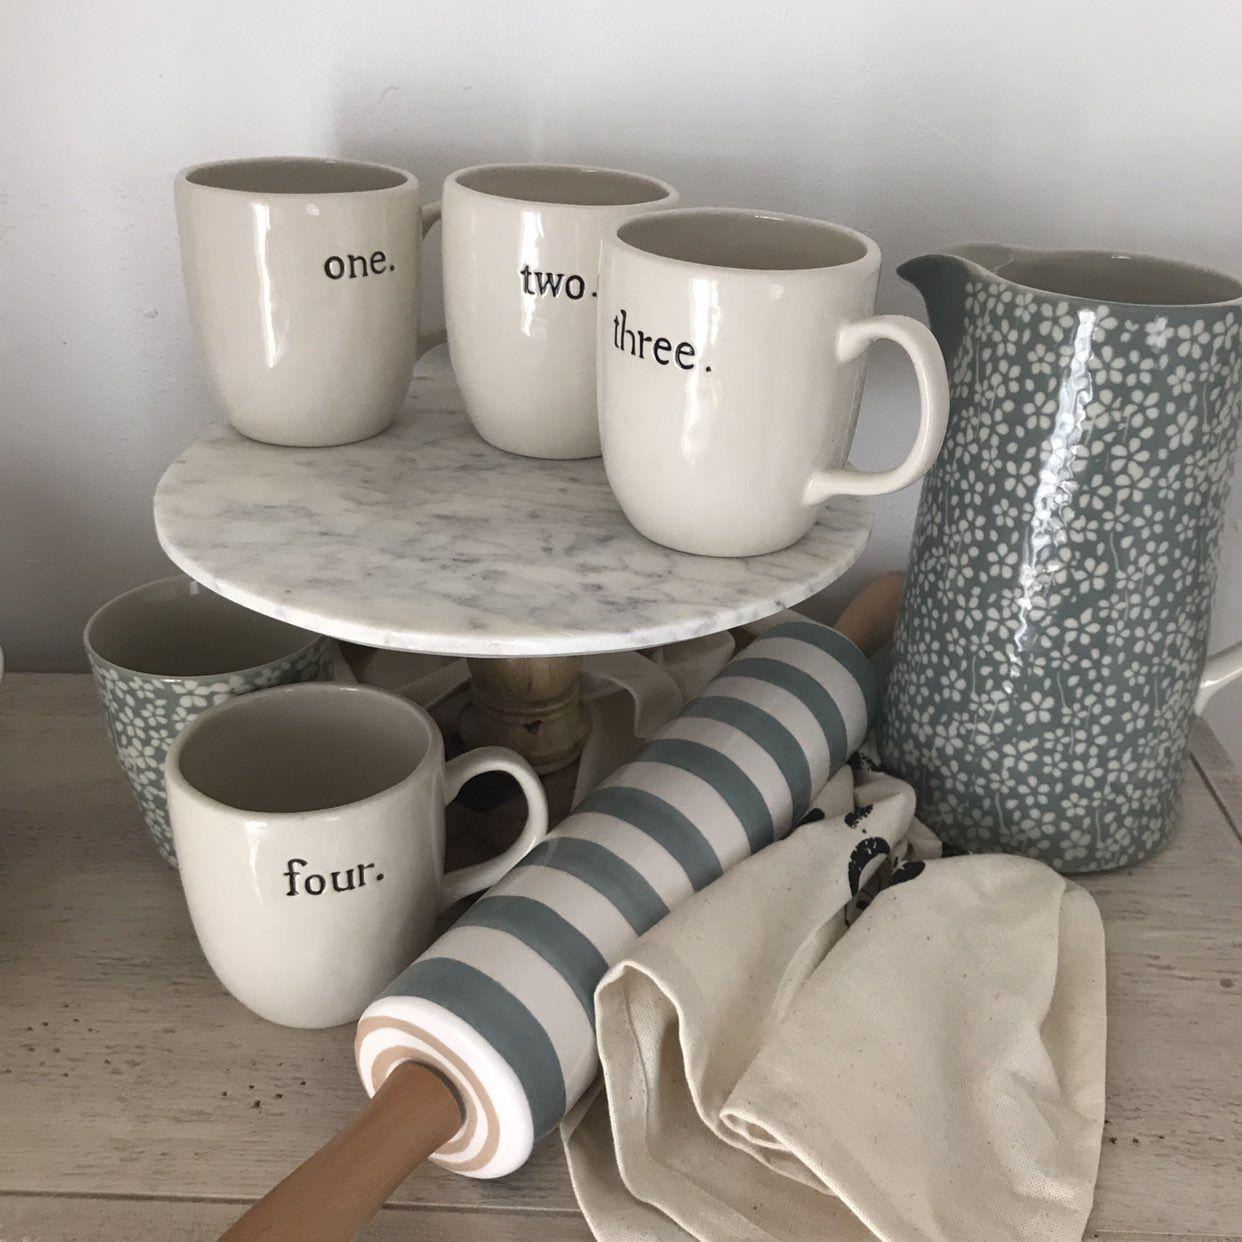 Rae Dunn Rare Boutique Discontinued Mugs Mercari Buy Sell